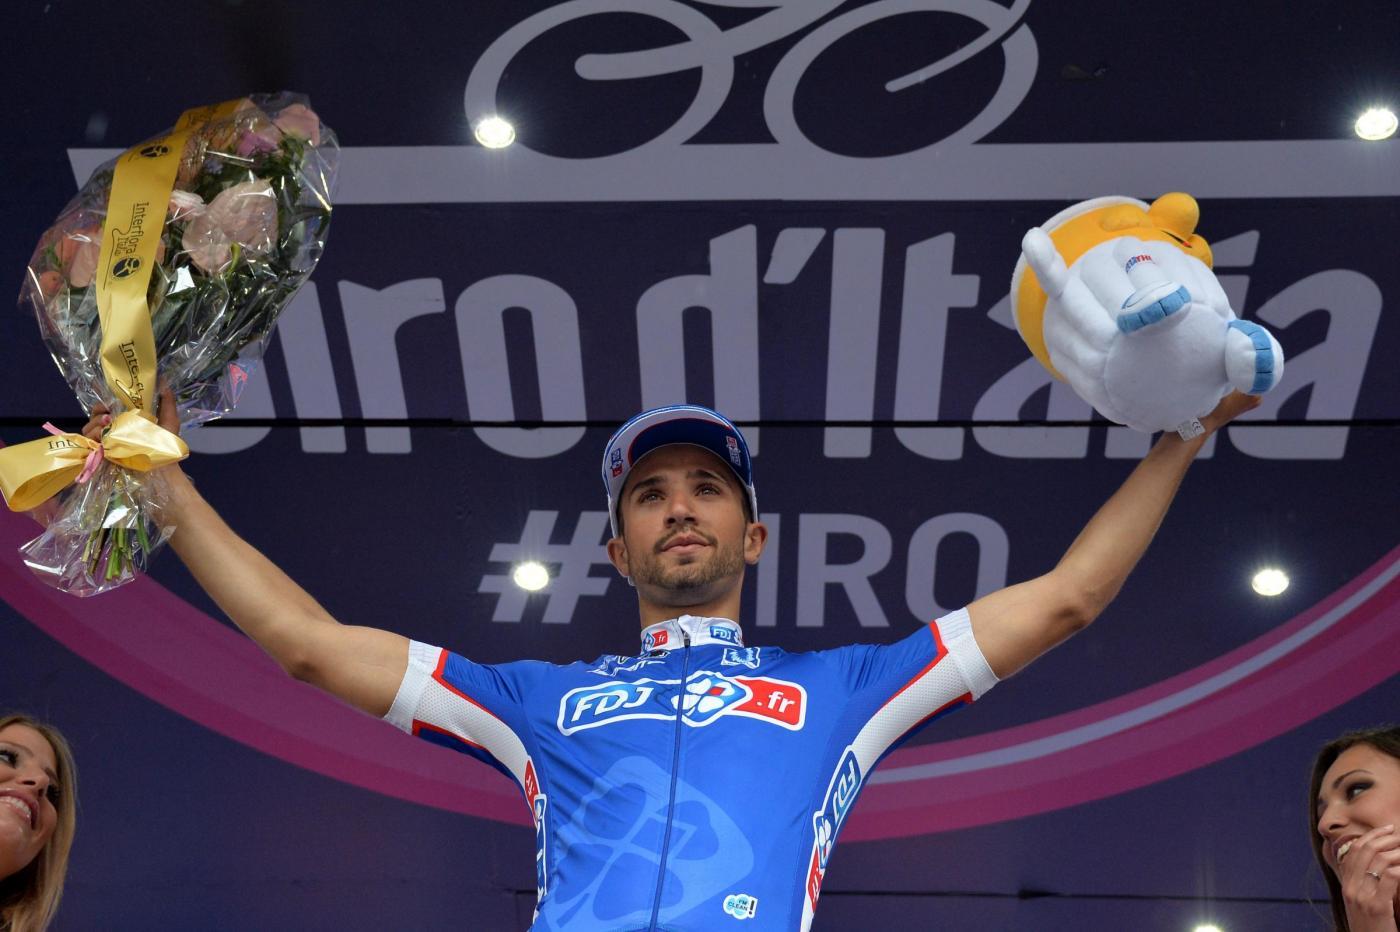 Giro d'Italia 2014: settima tappa ancora a Bouhanni